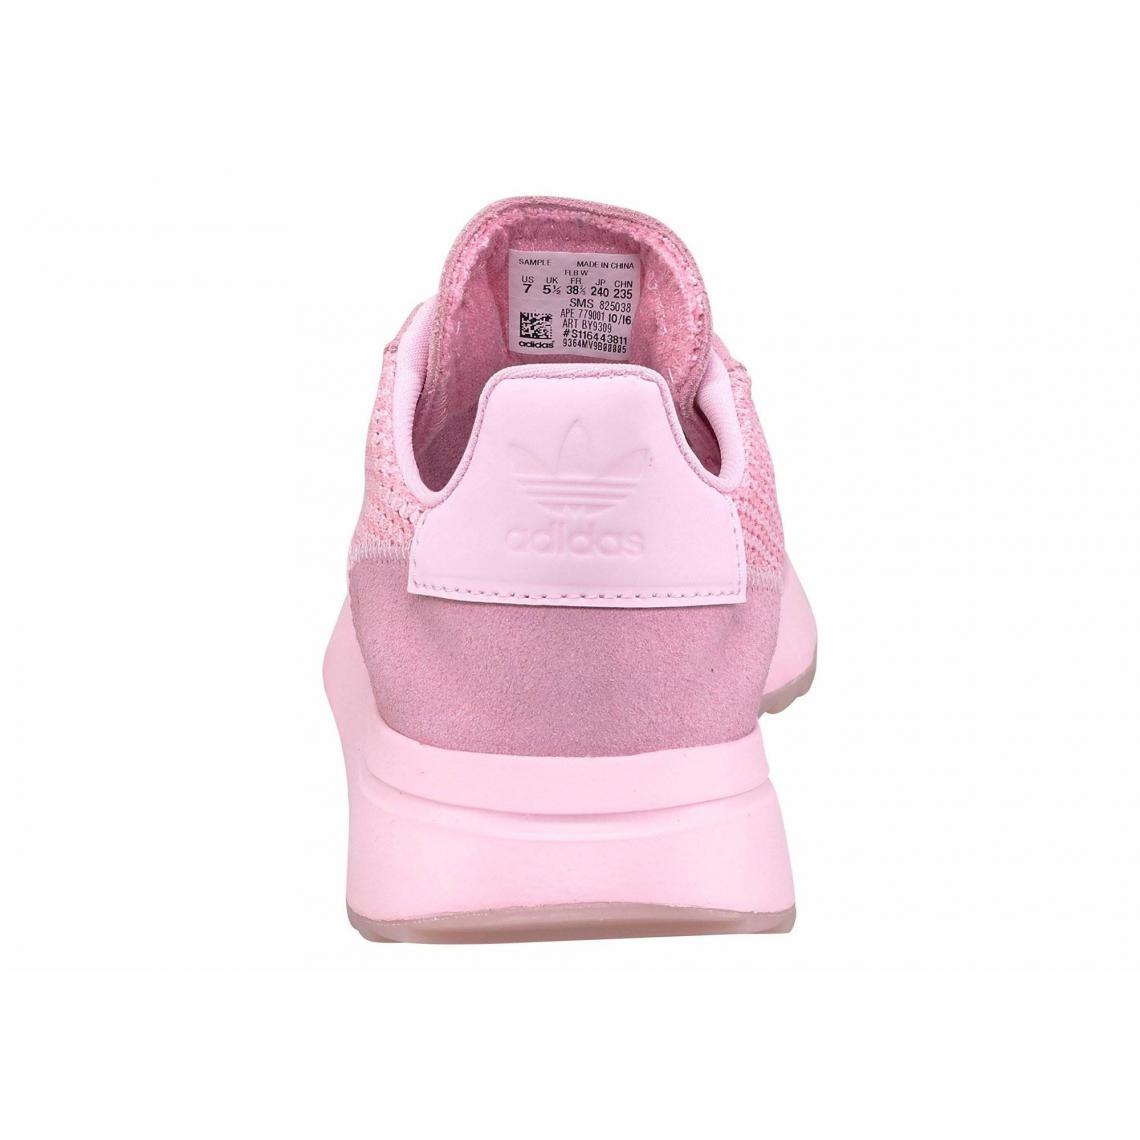 5741c889dd Sneaker Originals Flashback W femme adidas - Rose Vif Adidas Originals